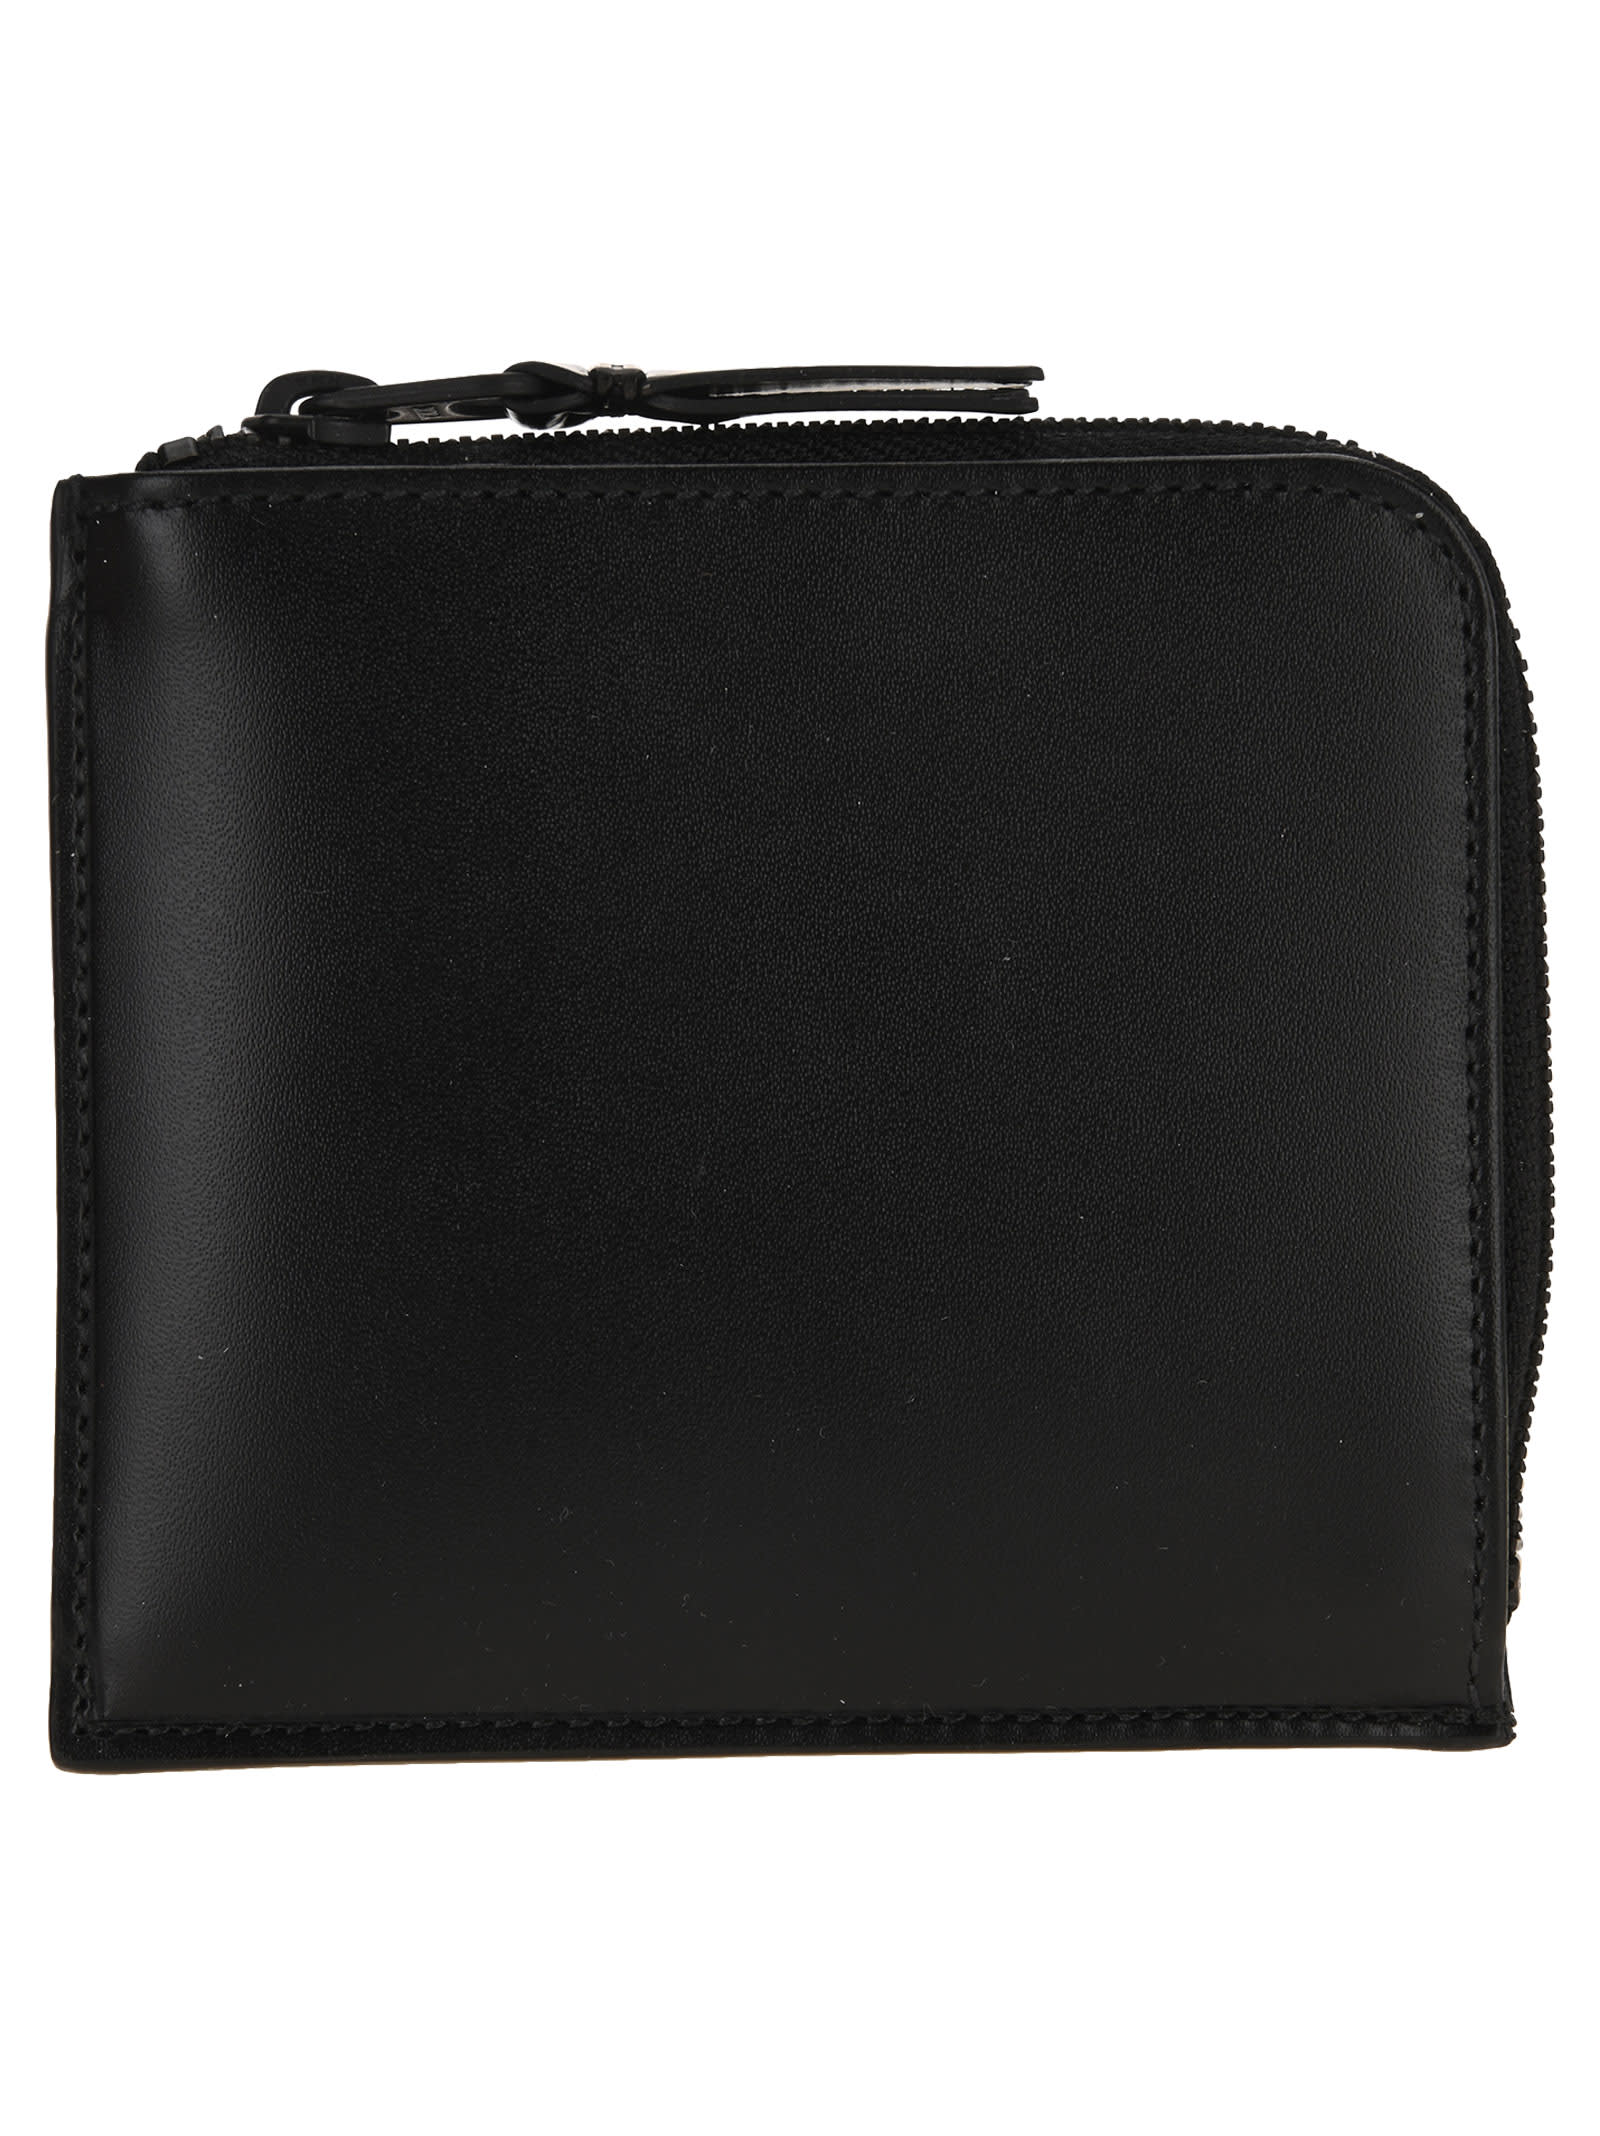 Comme Des Garcons Wallet Black Small Zip Wallet